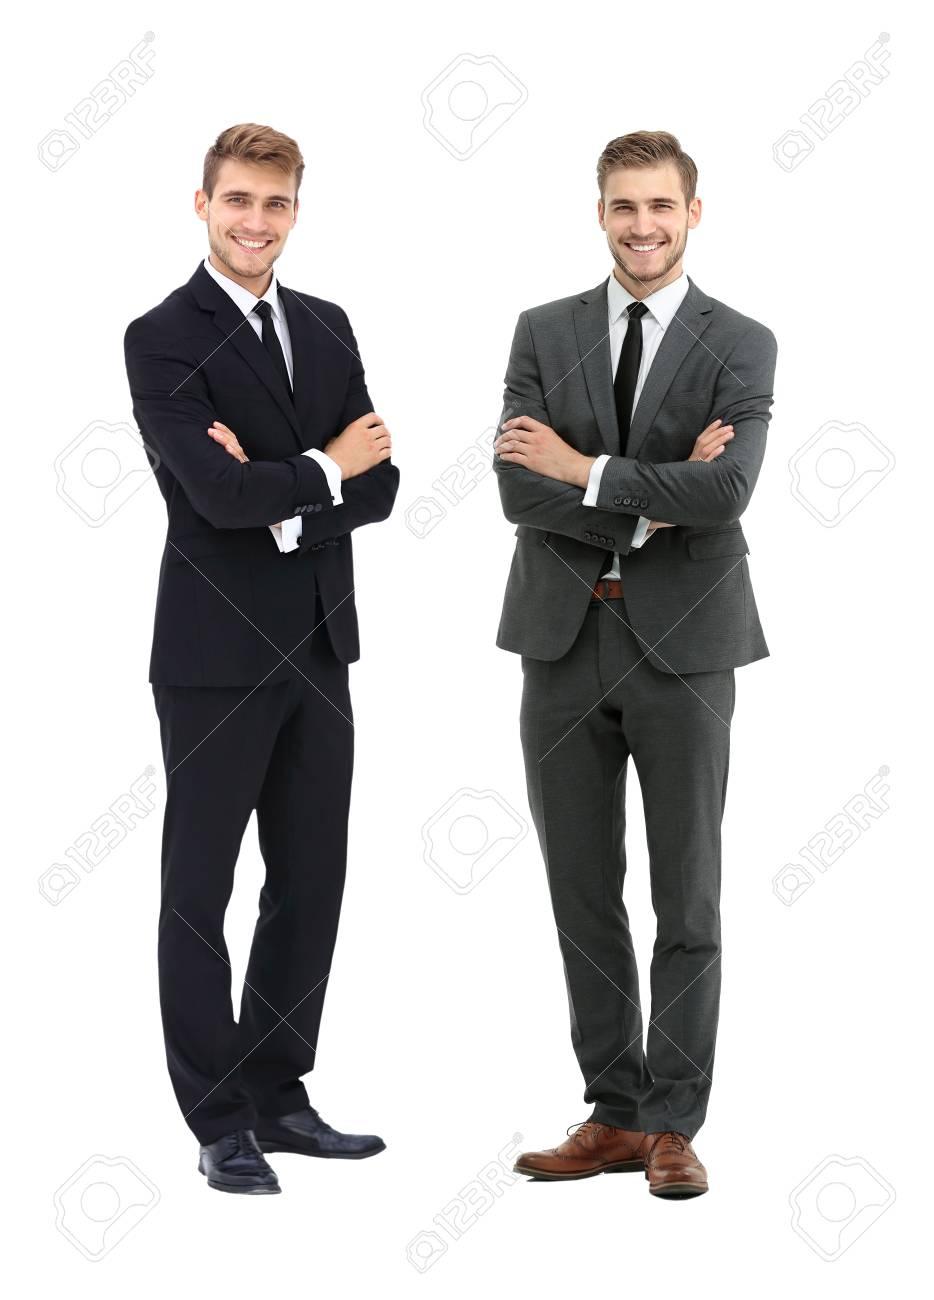 Deux Hommes En Costume : hommes, costume, Hommes, Costume, Delivery, Chantilly.bemkt.com.mx